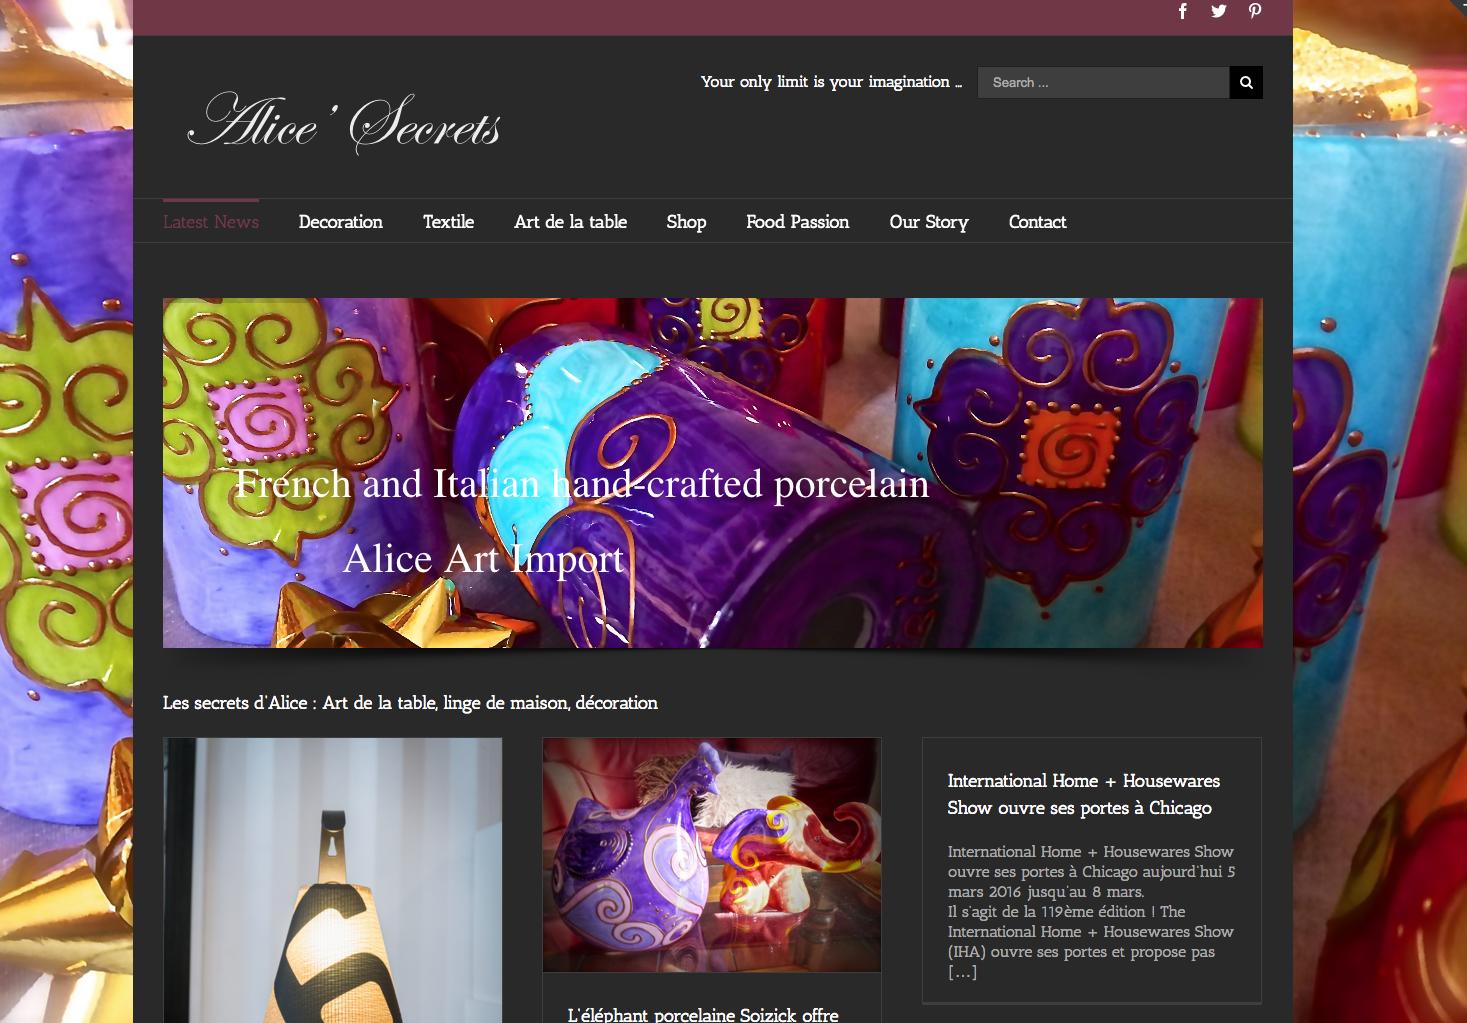 Site SecretsdAlice.com généré par THEORIX